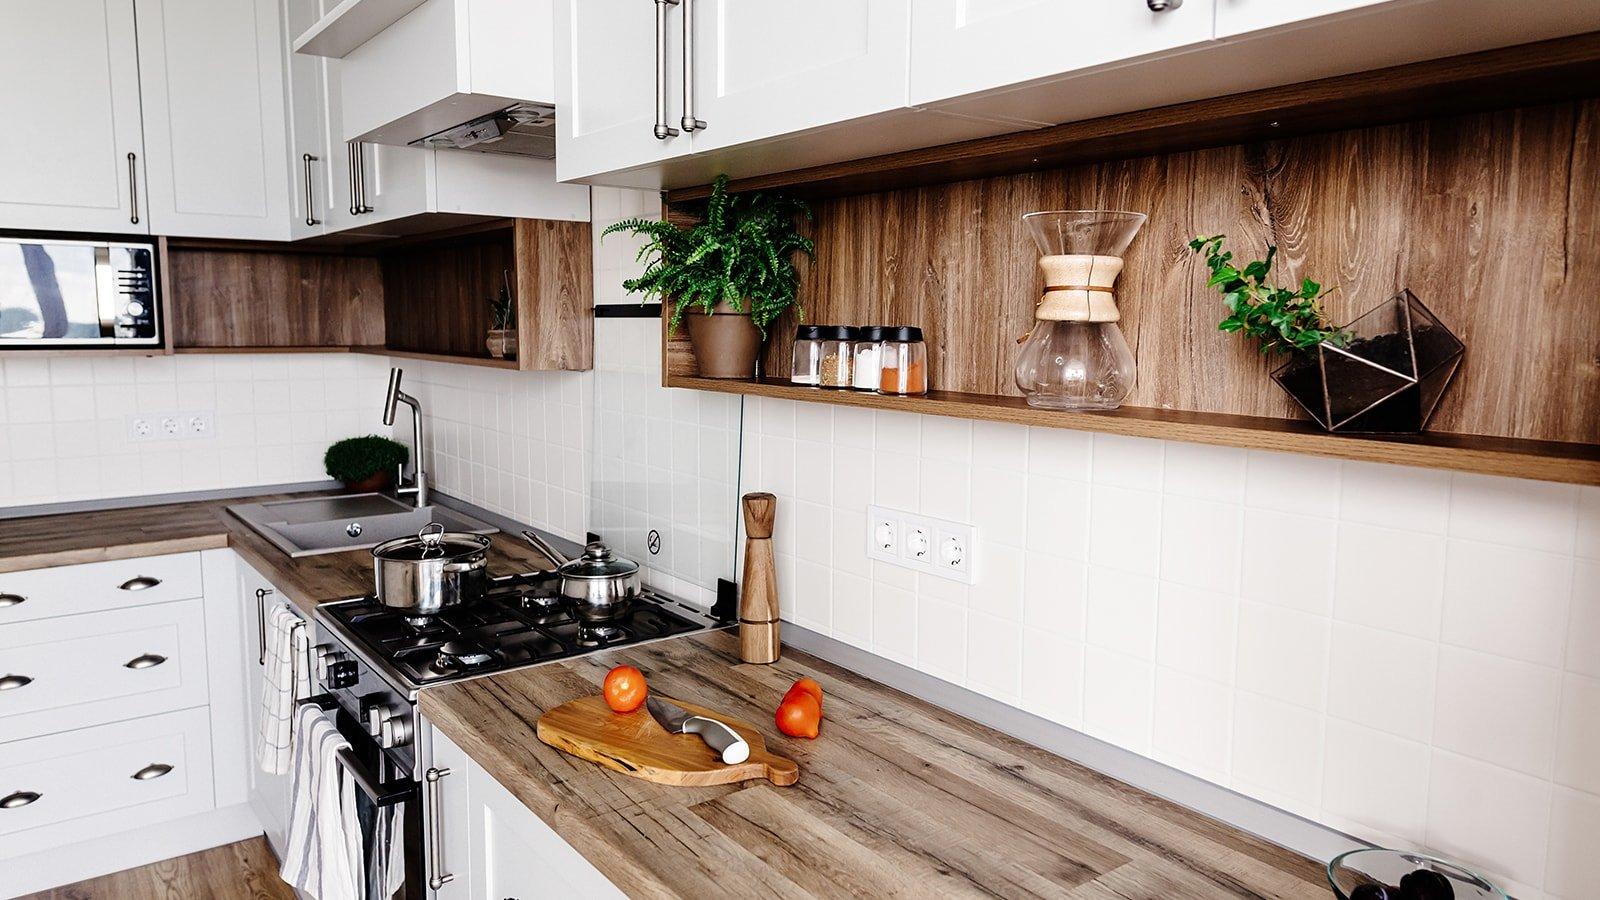 Stylish kitchen with no pests